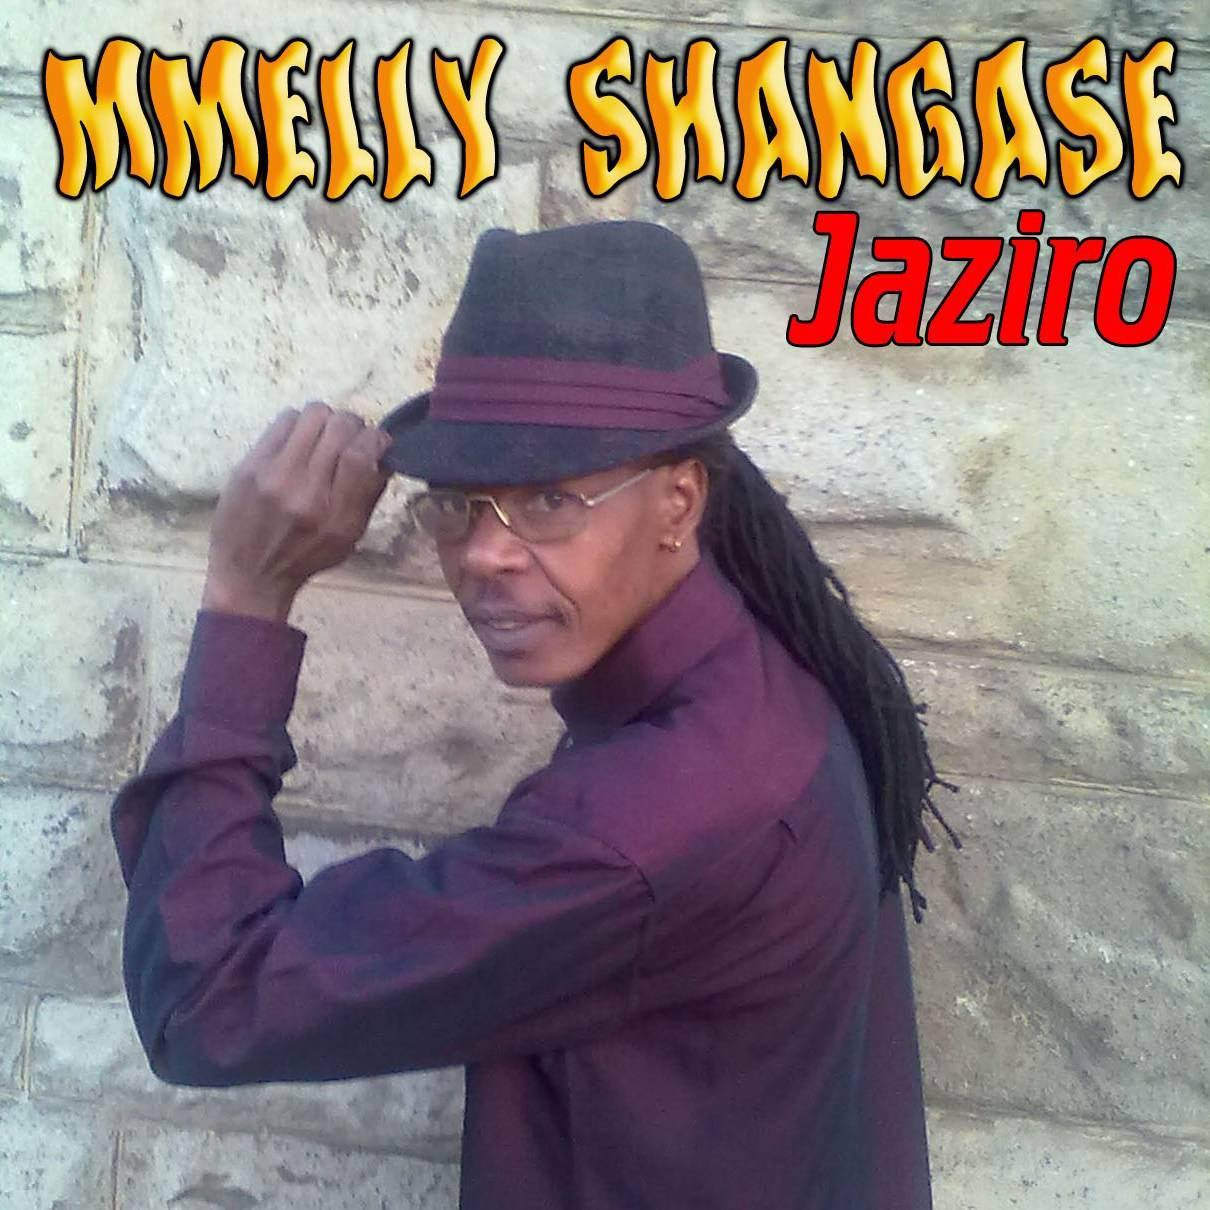 MMELLY SHANGASE NEW ALBUM JAZIRO